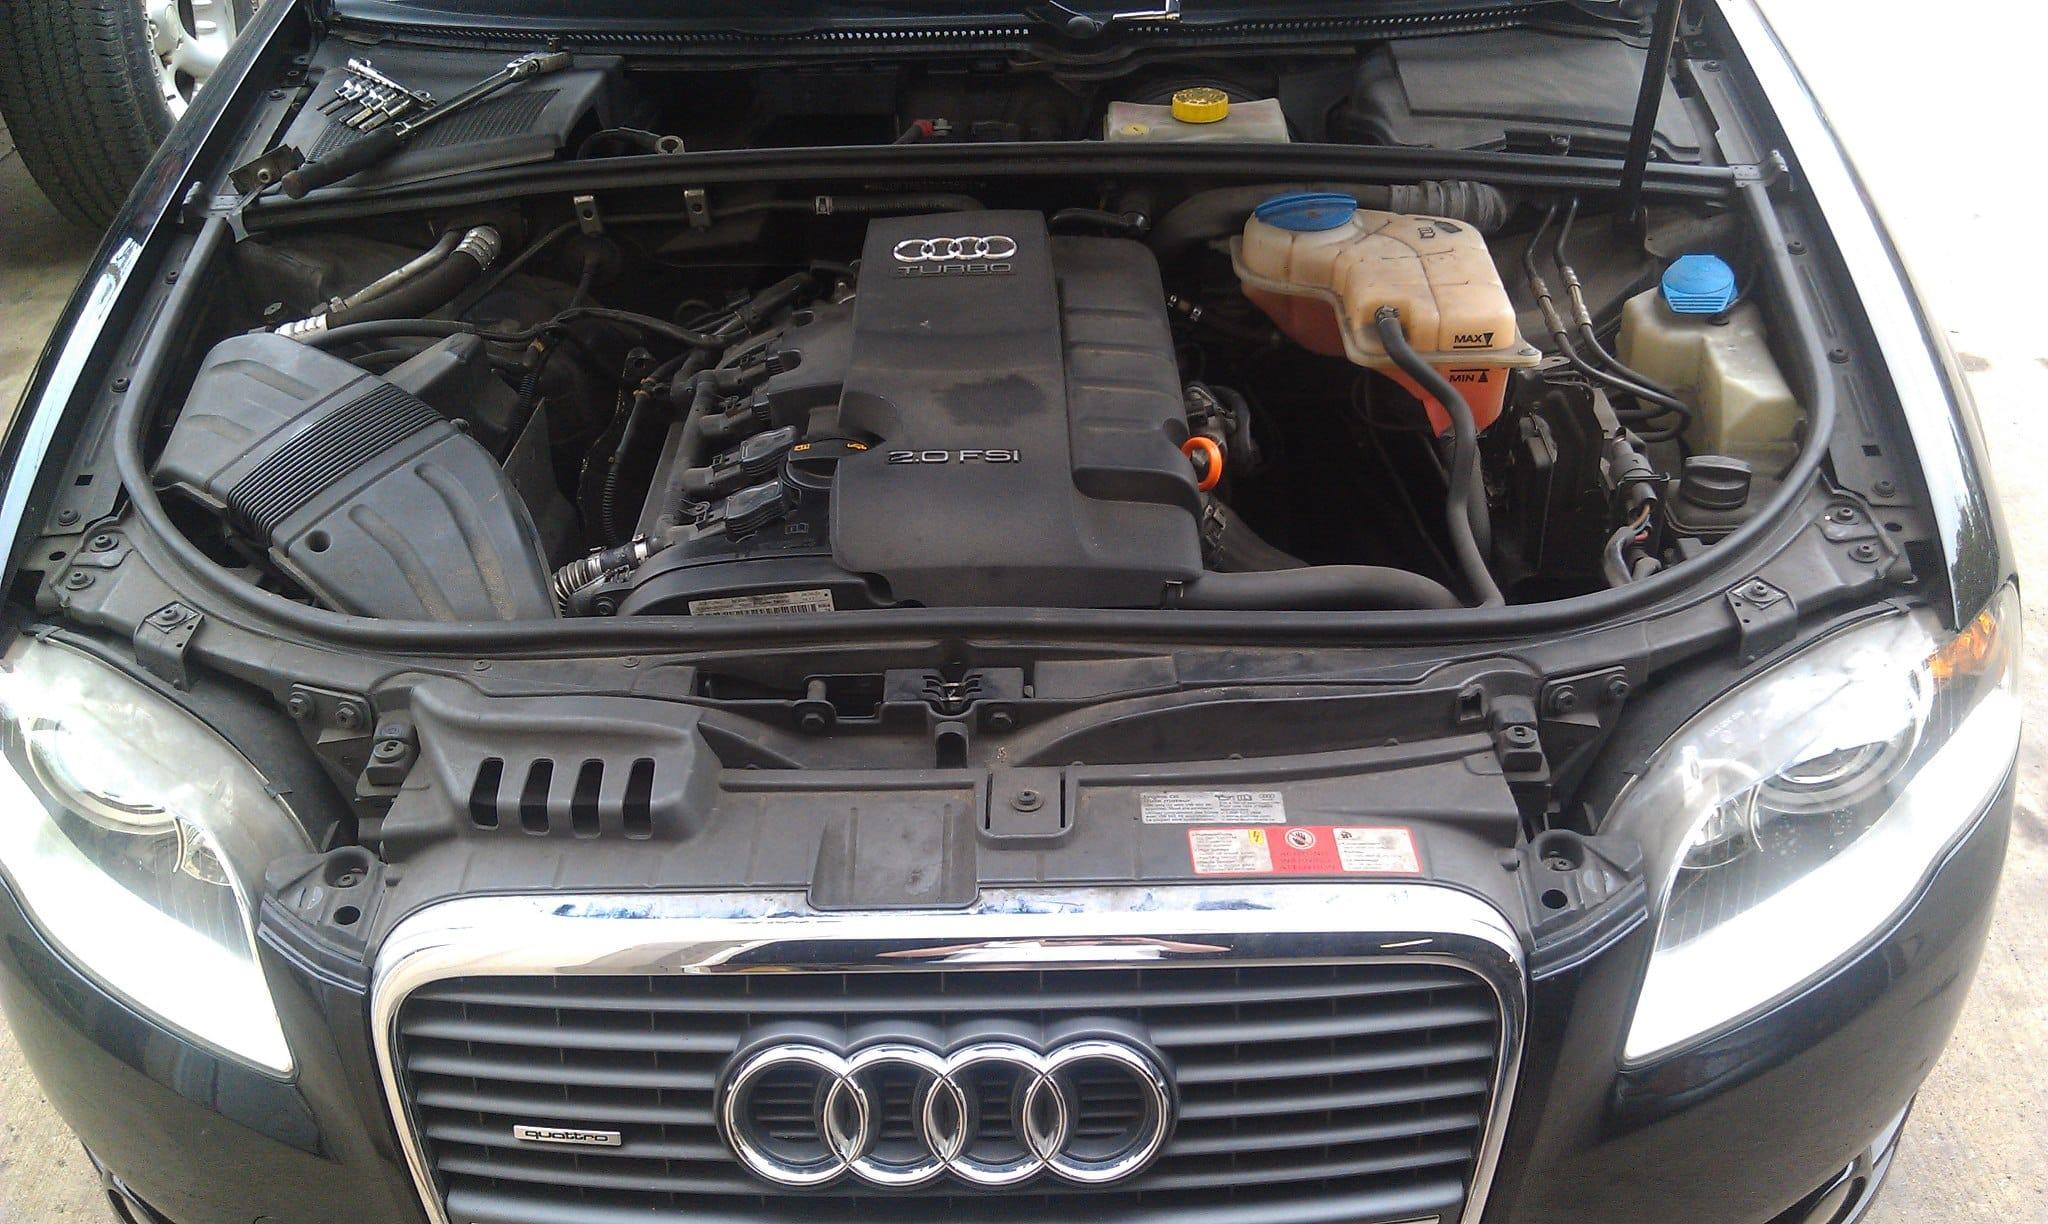 Plainfield Audi Repair Shop In Plainfield Il on Brake Pad Washers